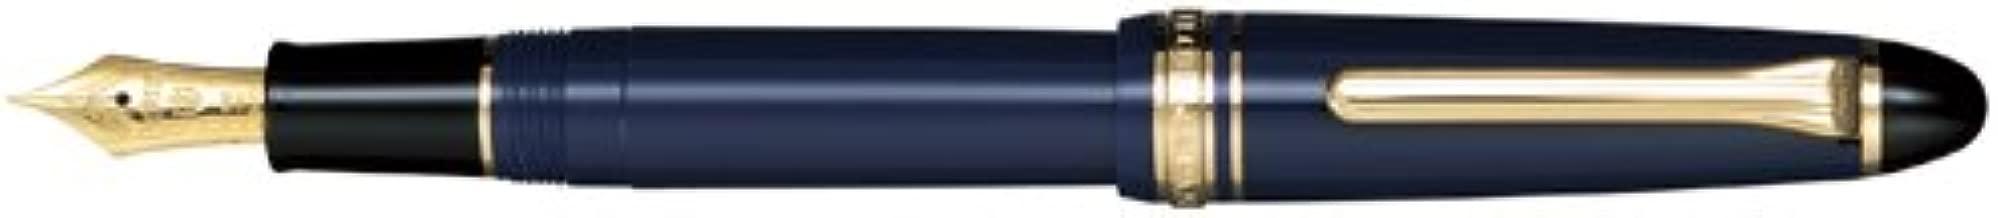 sailor 1911 standard blue